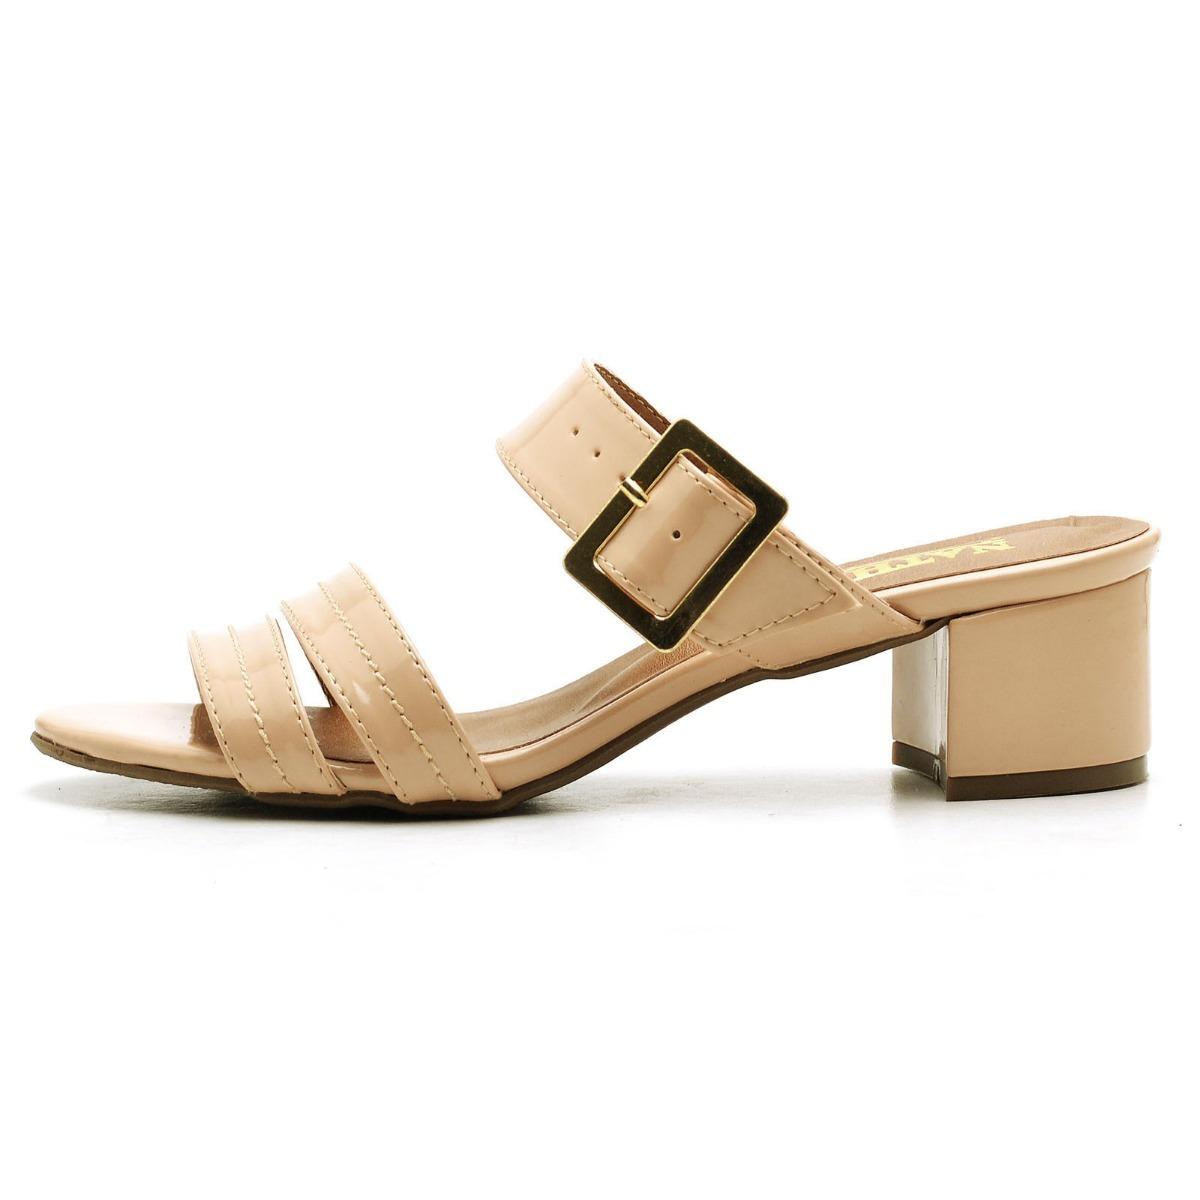 fc36d2f40 sandalia feminina anabela salto baixo sapato conforto fivela. Carregando  zoom.